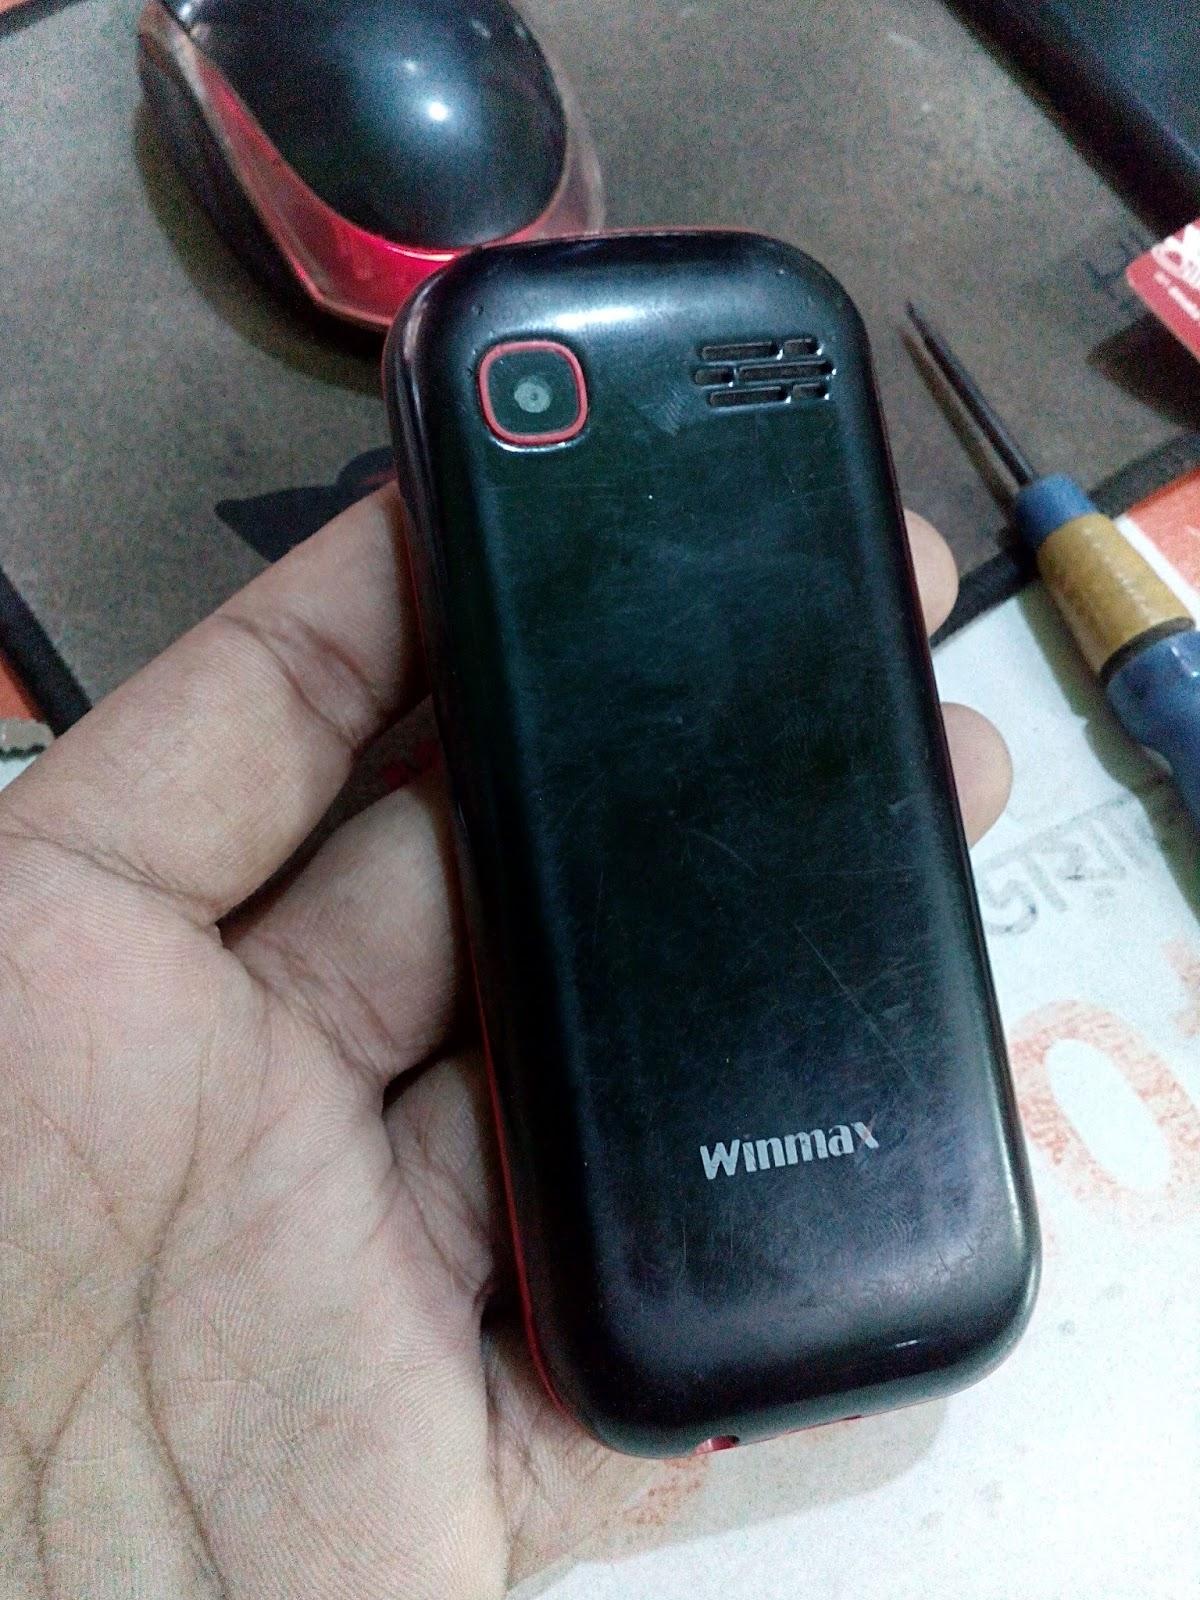 SATKHIRA GSM-LAB: Winmax BD33 MT6261 Flash File 1000% ok